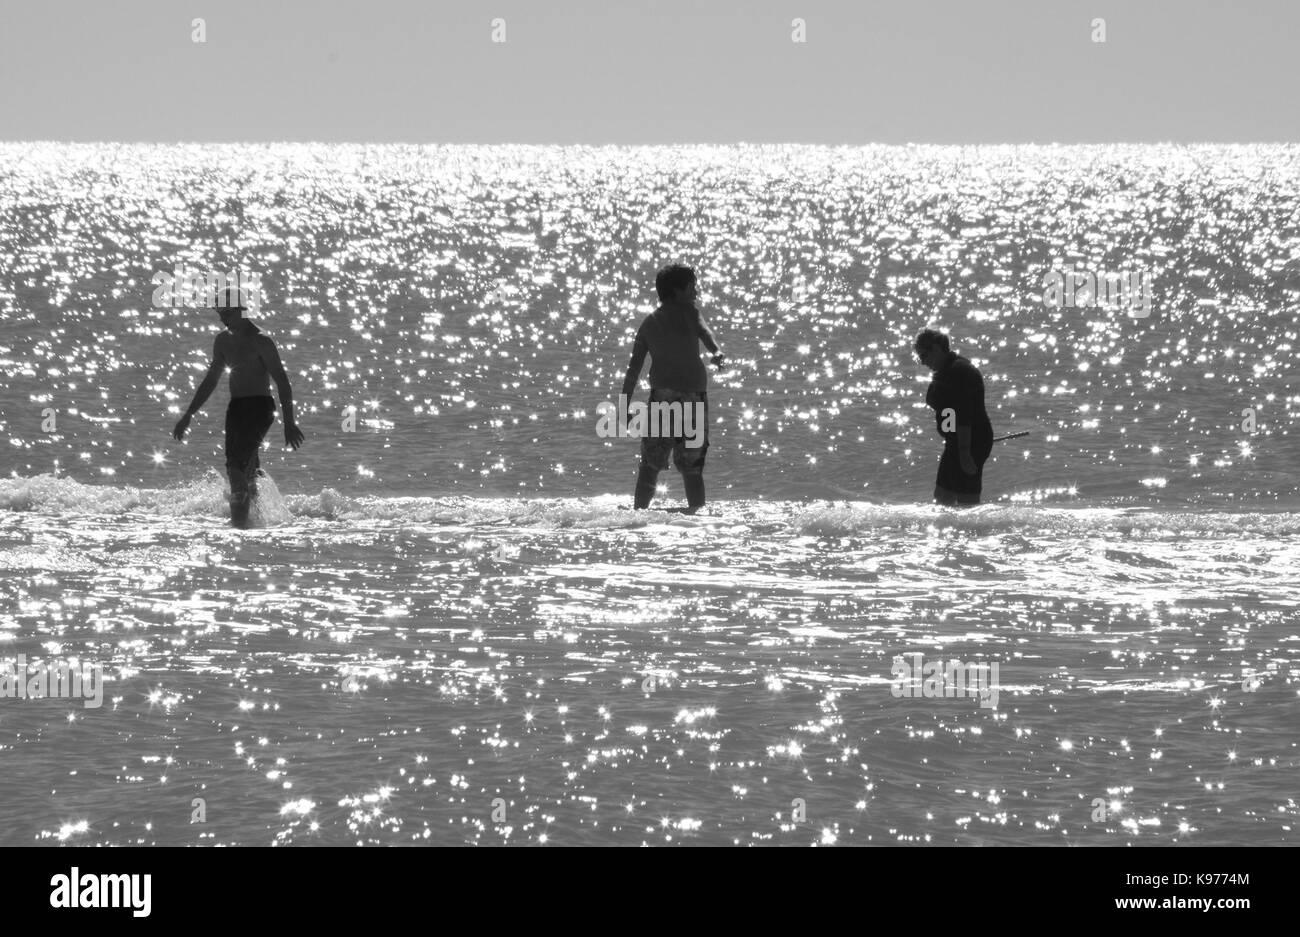 Three bathers check the shallow glistening water of Sanibel, Florida for seashells. - Stock Image